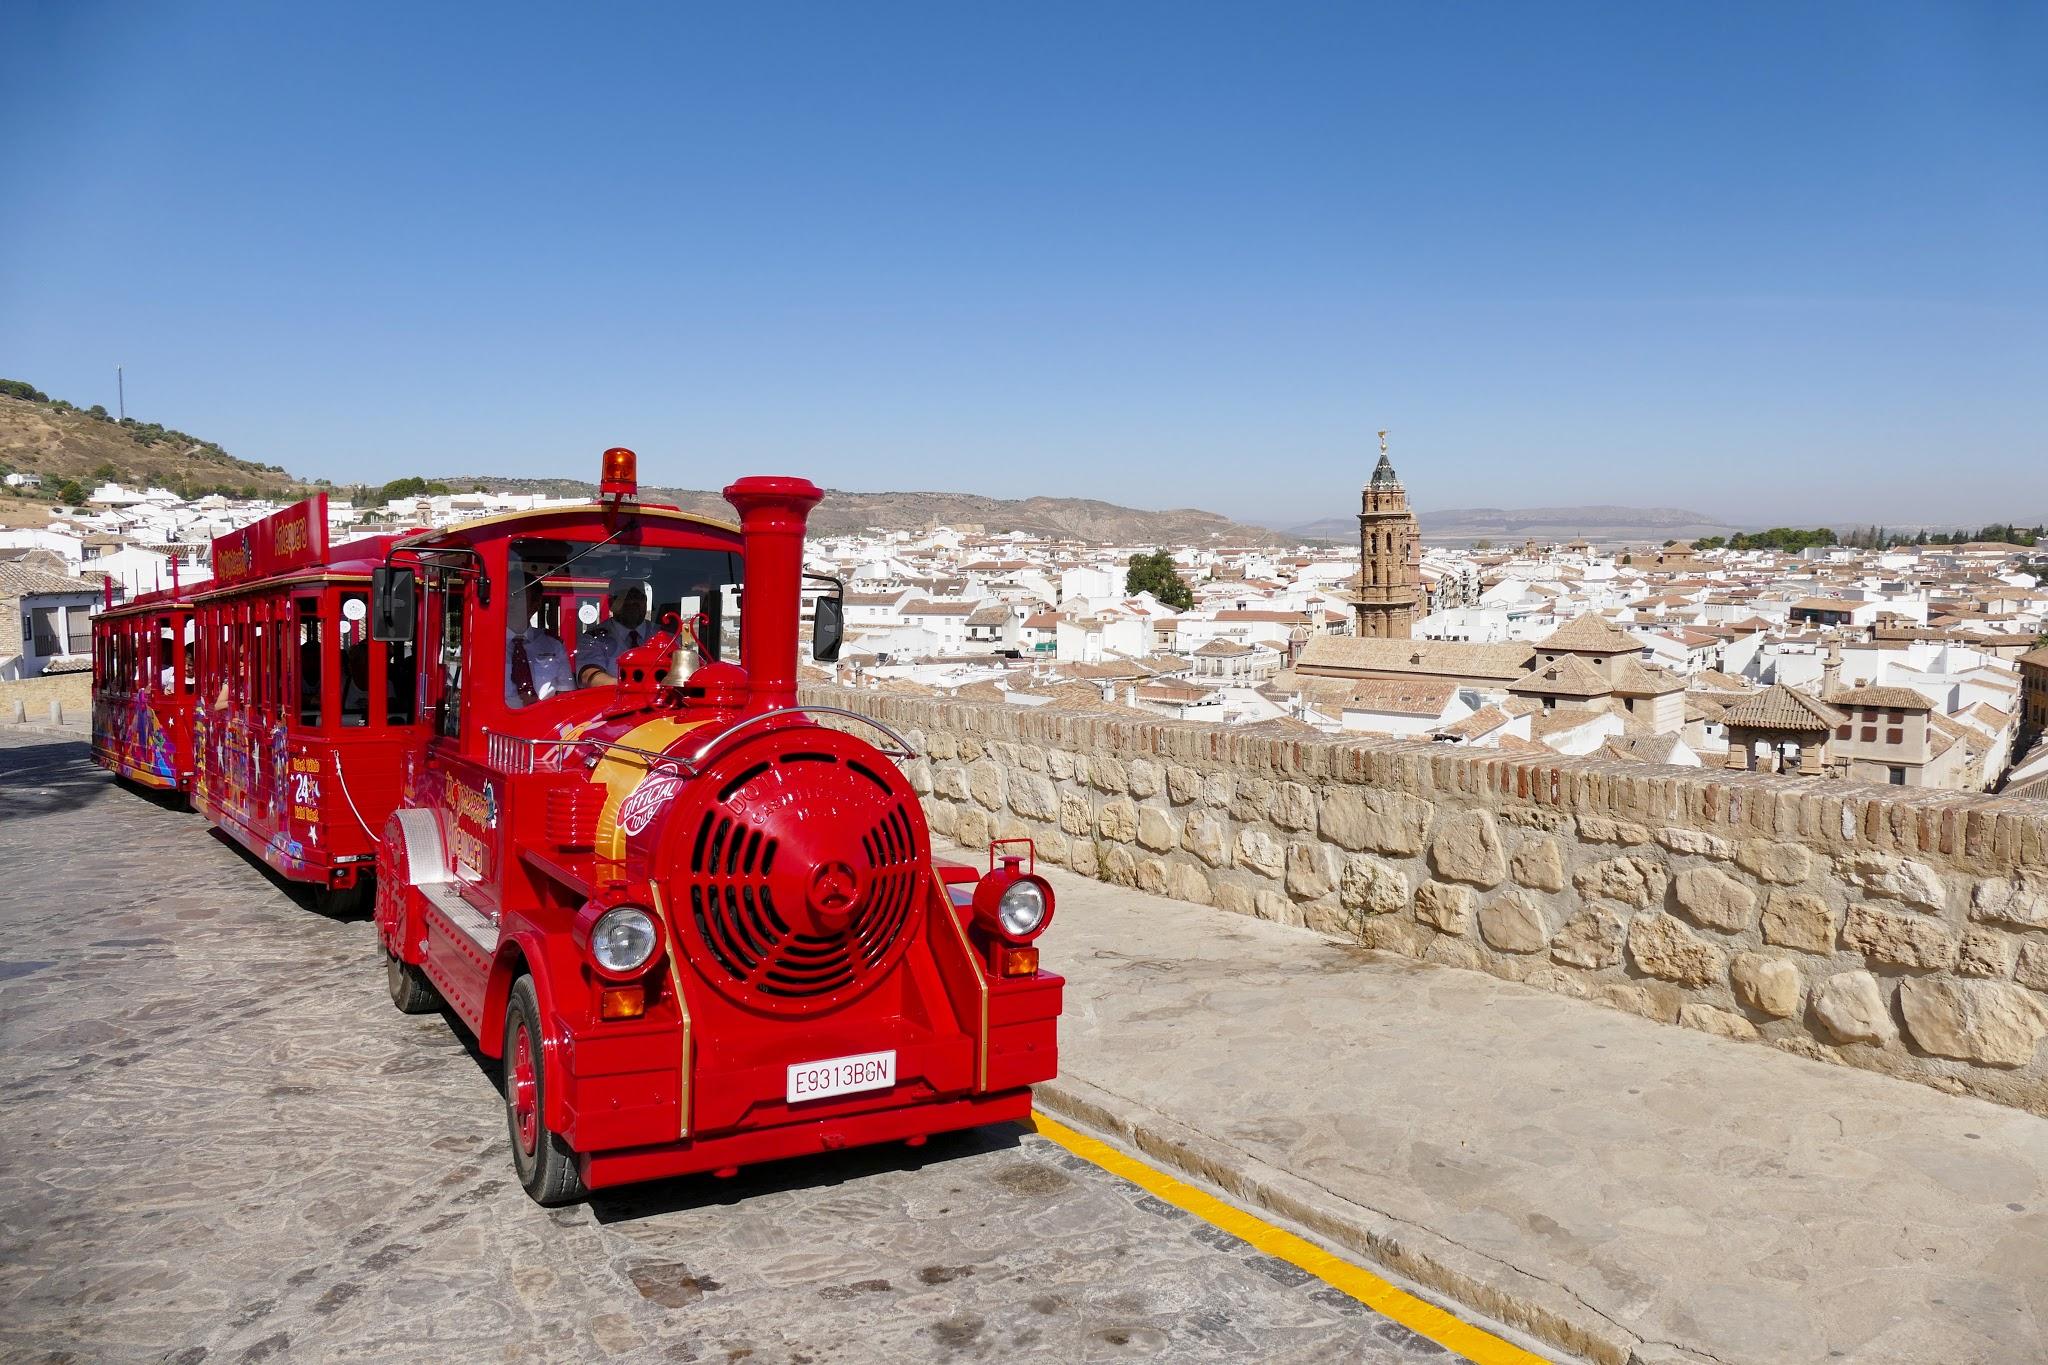 tren turistico city sightseeing antequera alcazaba